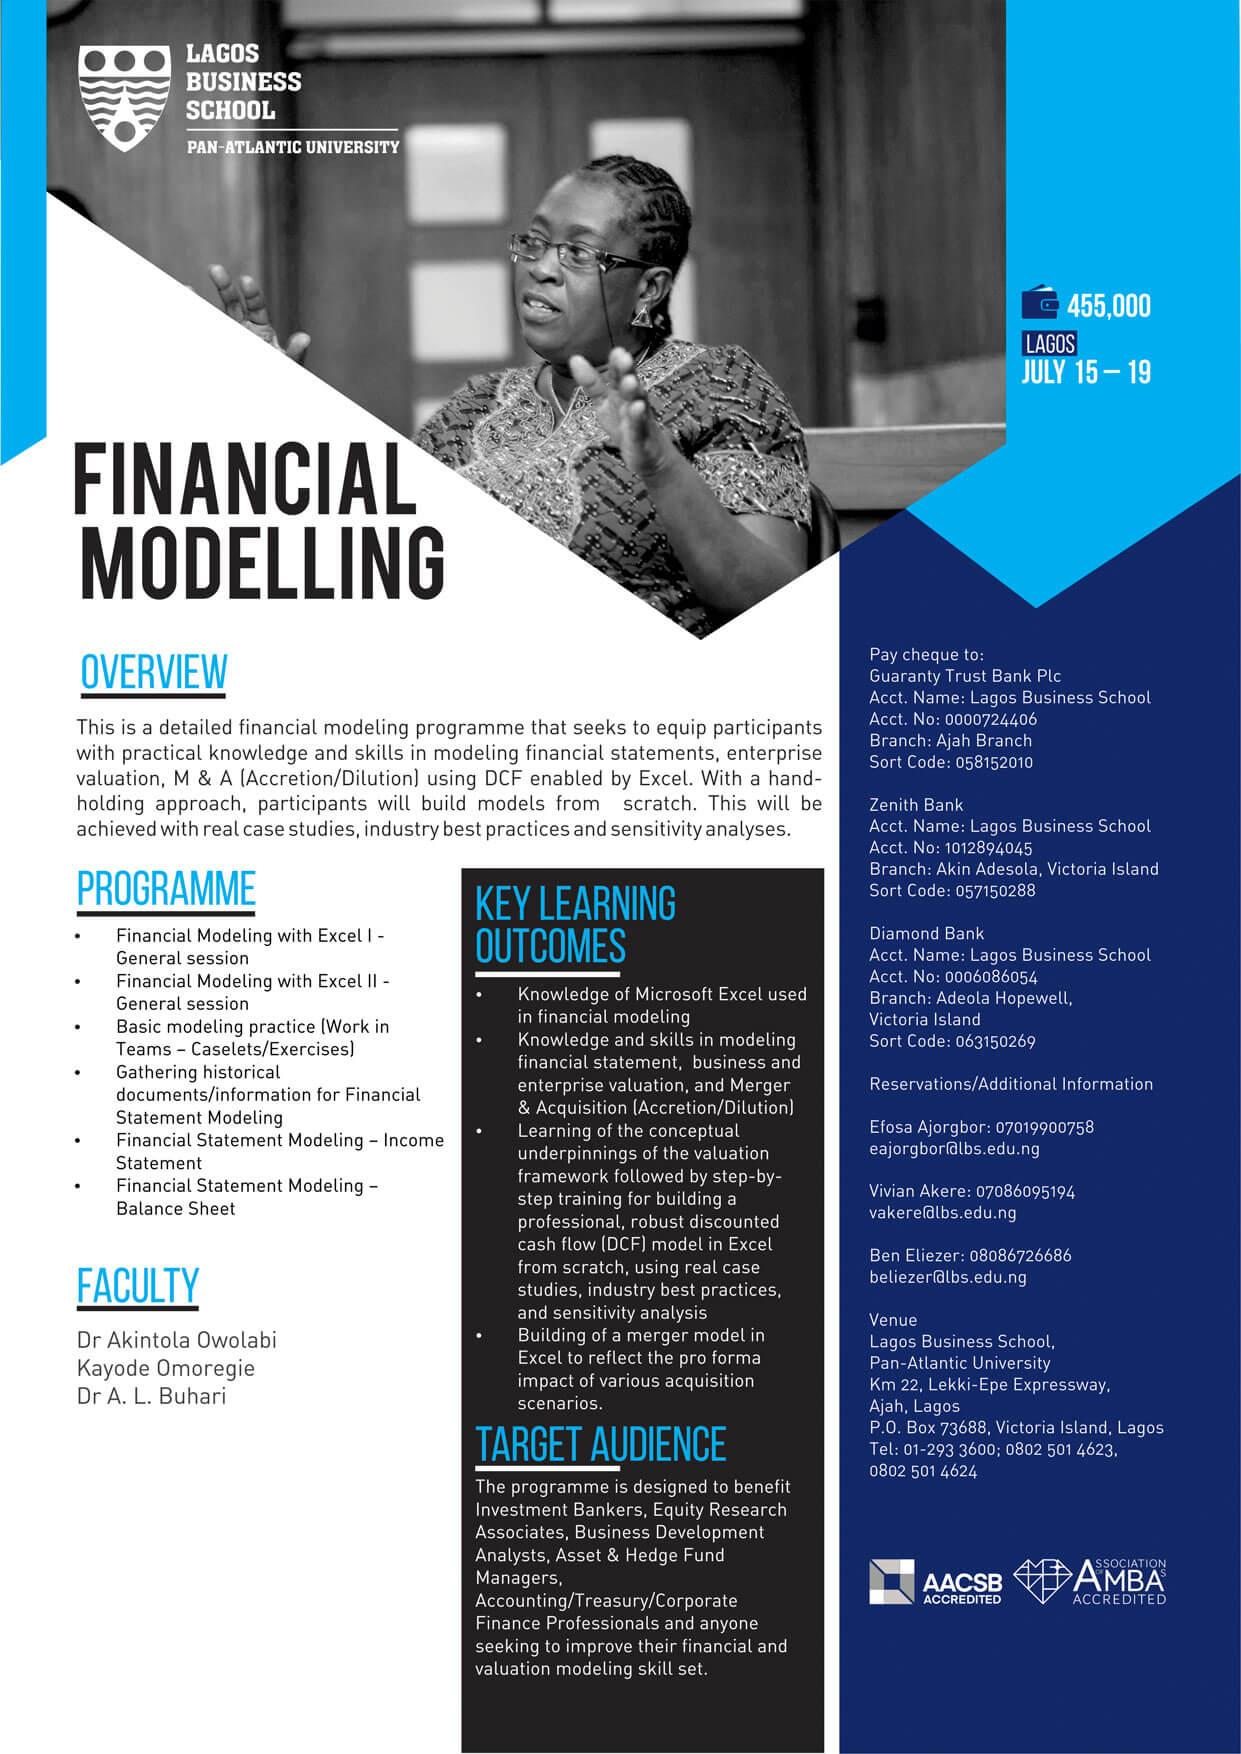 Financial Modelling | Lagos Business School